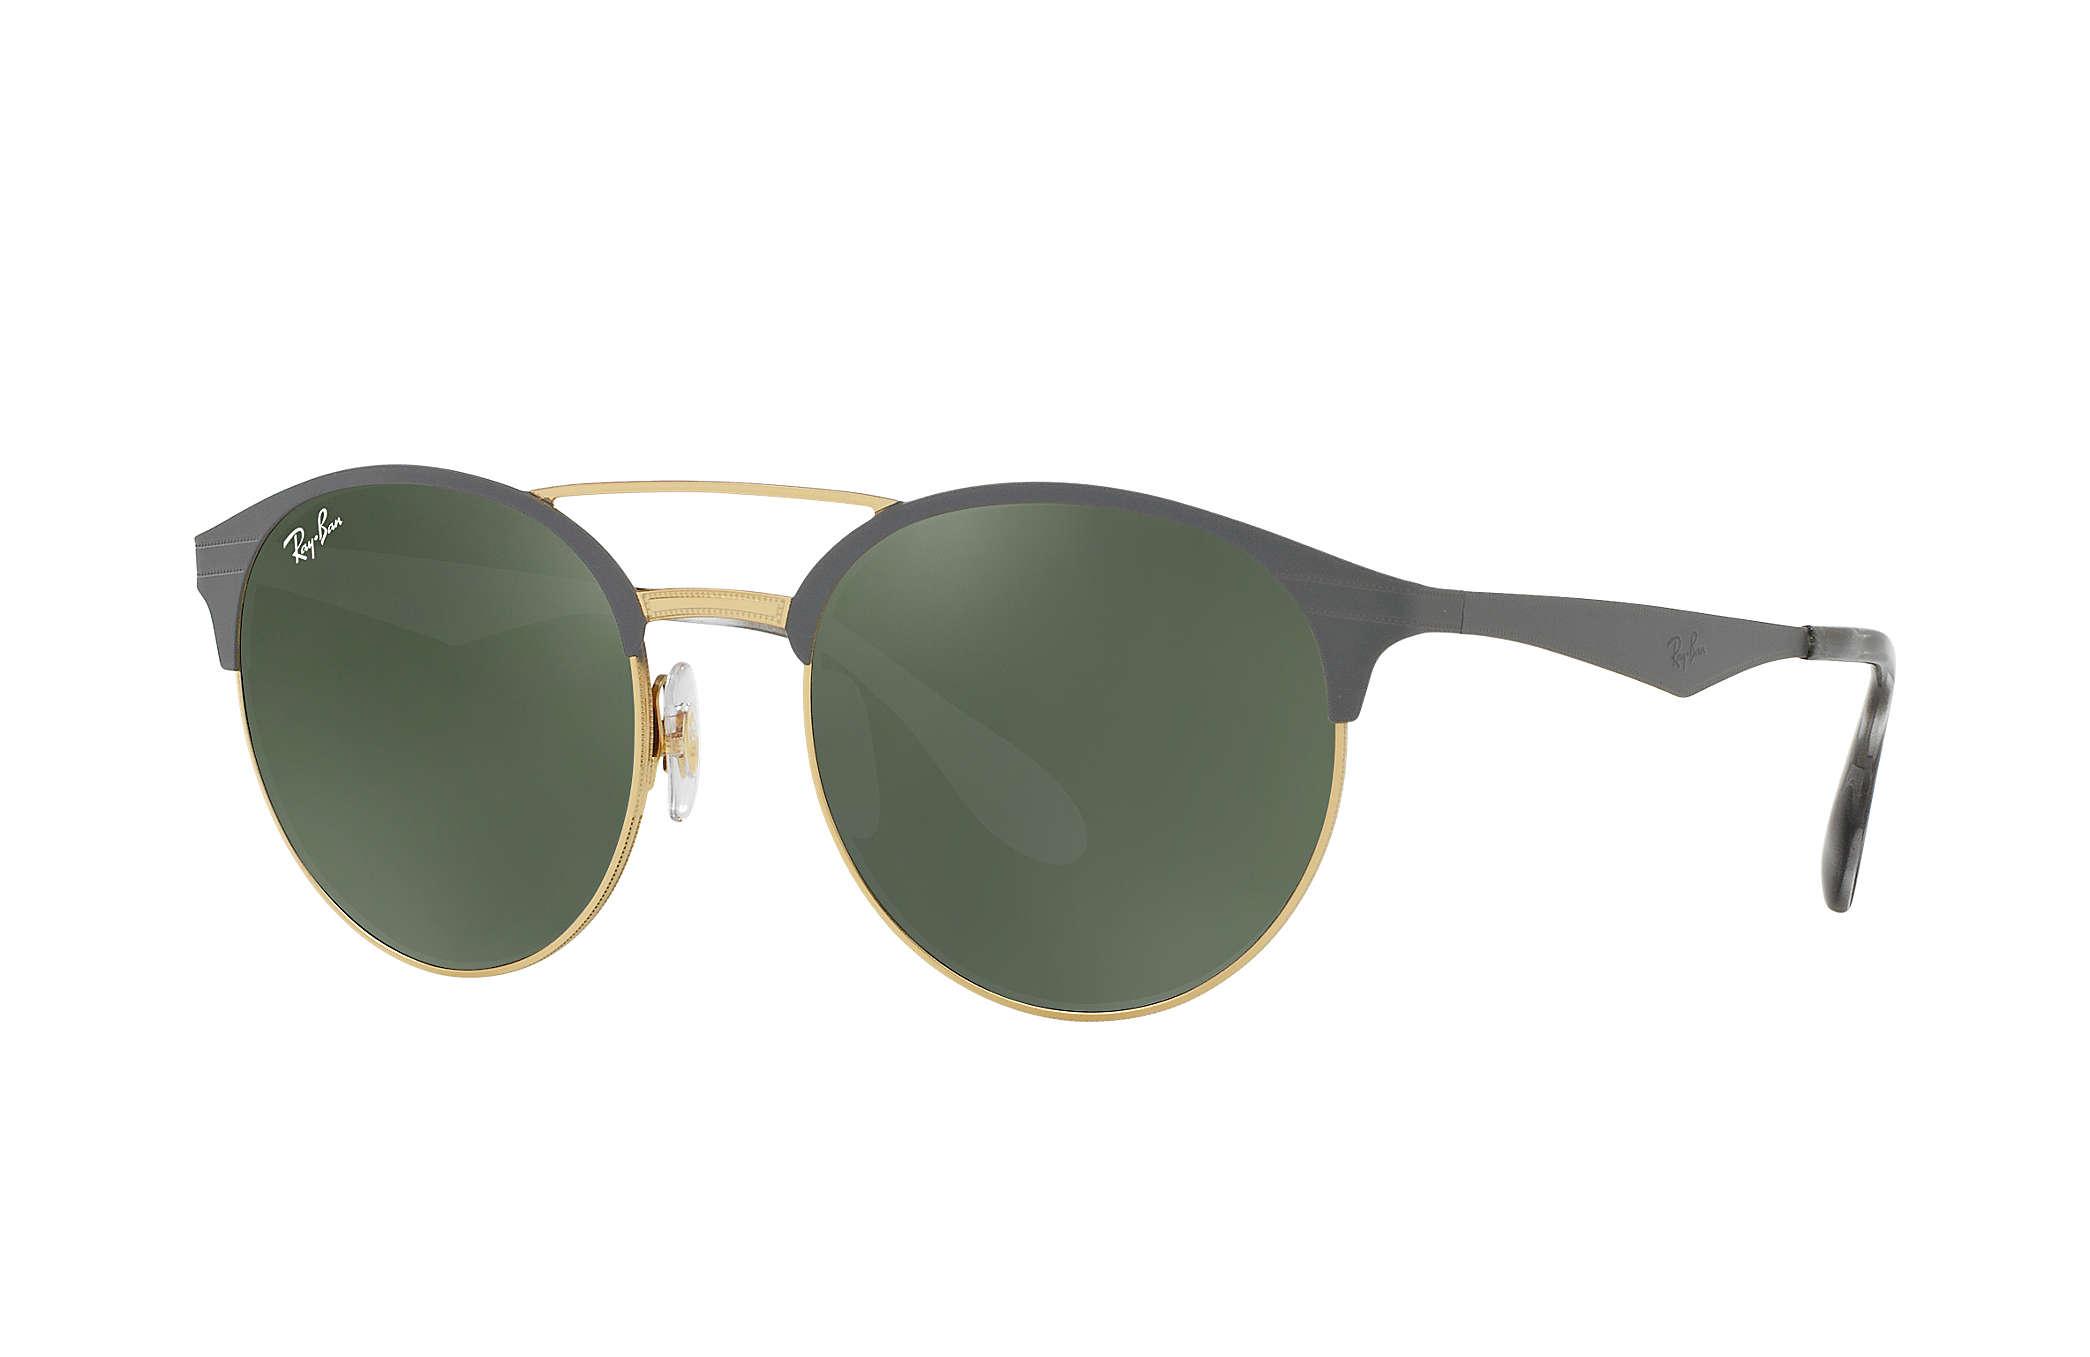 72c92af433b05 Ray-Ban RB3545 Gris - Metal - Lentes graduadas Green ...